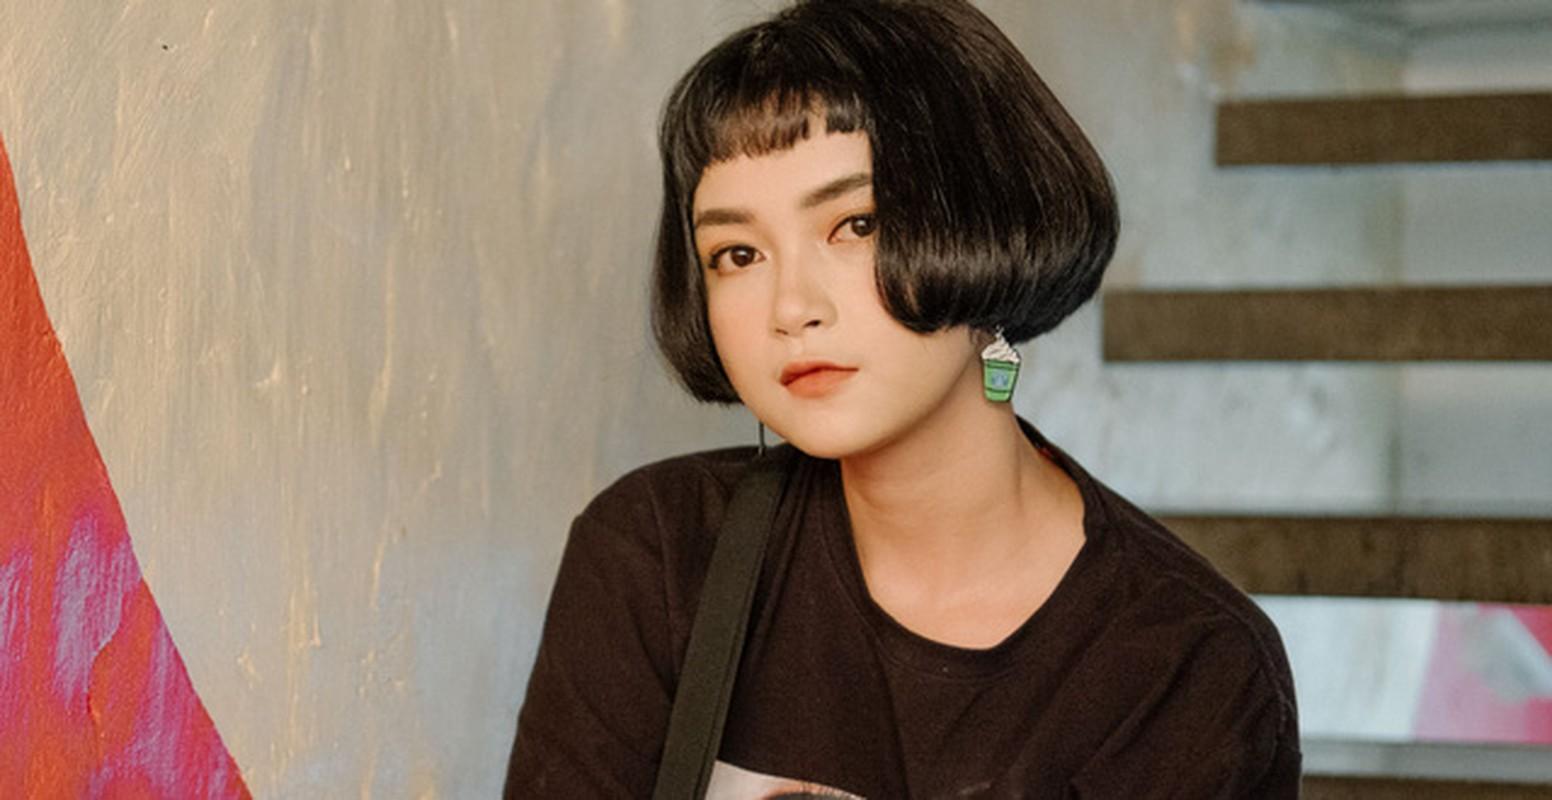 So huu toc ngan bong benh, dan hot girl Viet xinh het phan thien ha-Hinh-3